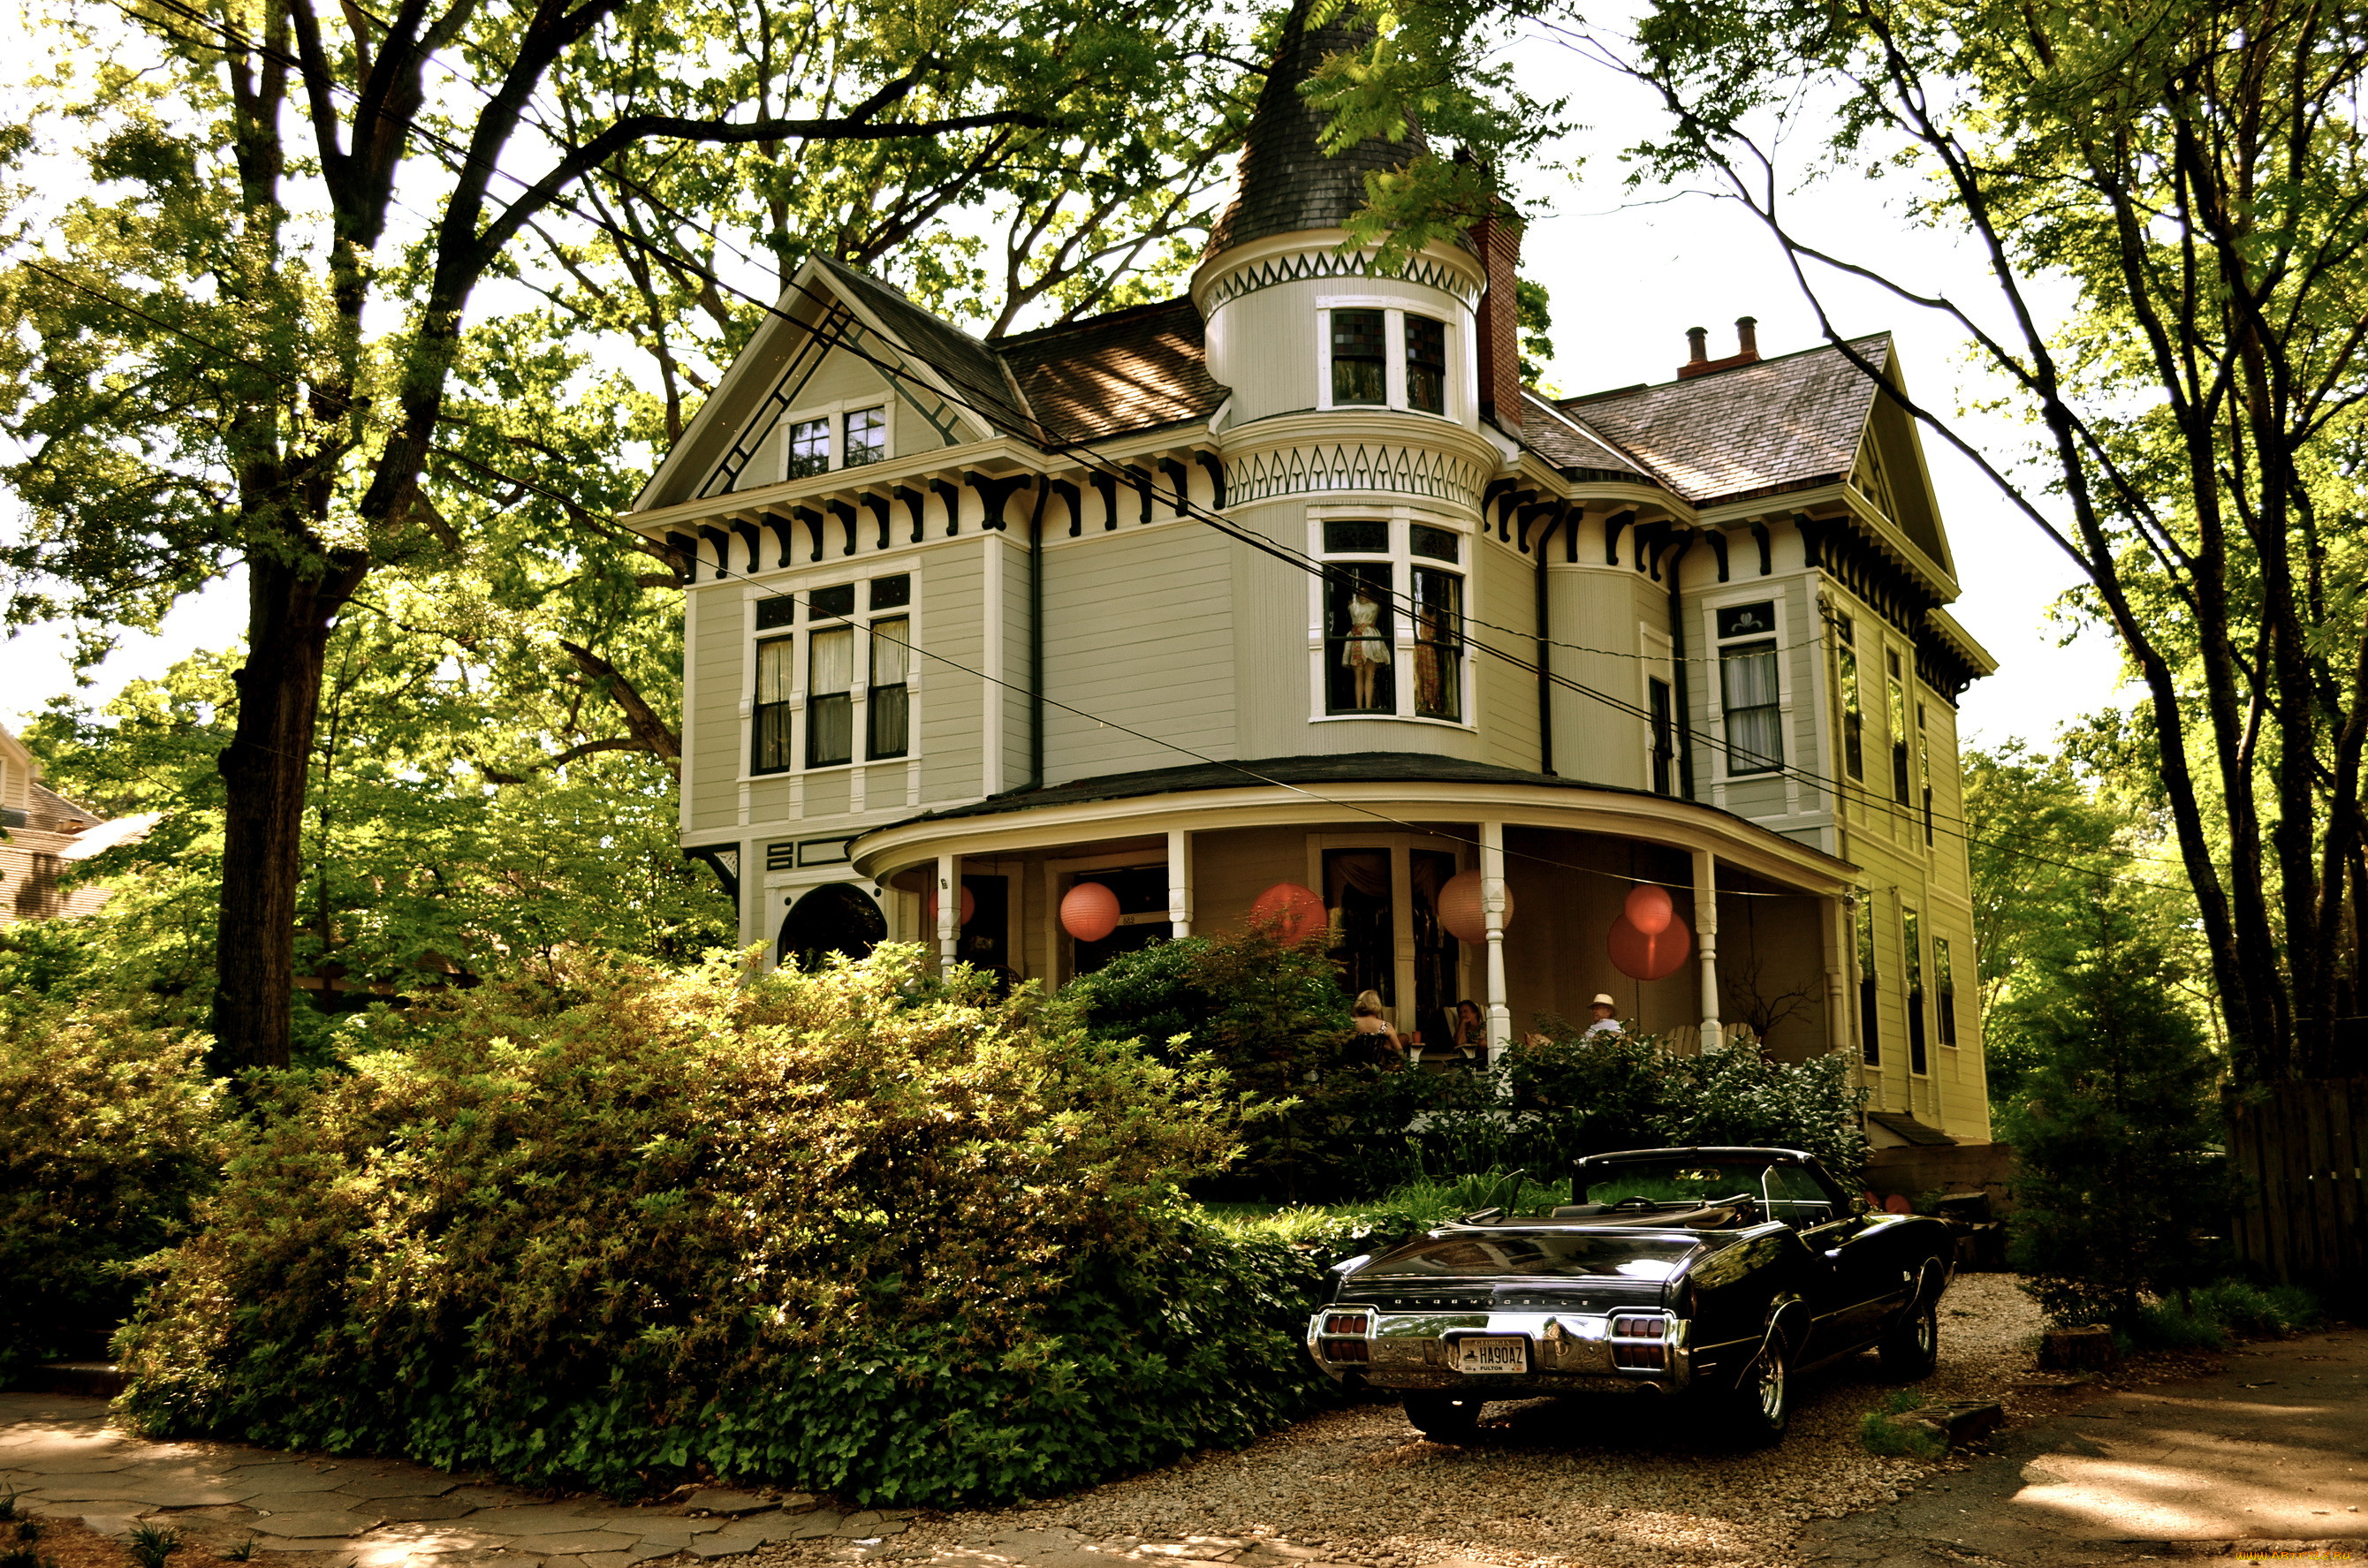 Картинки дом с автомобилем